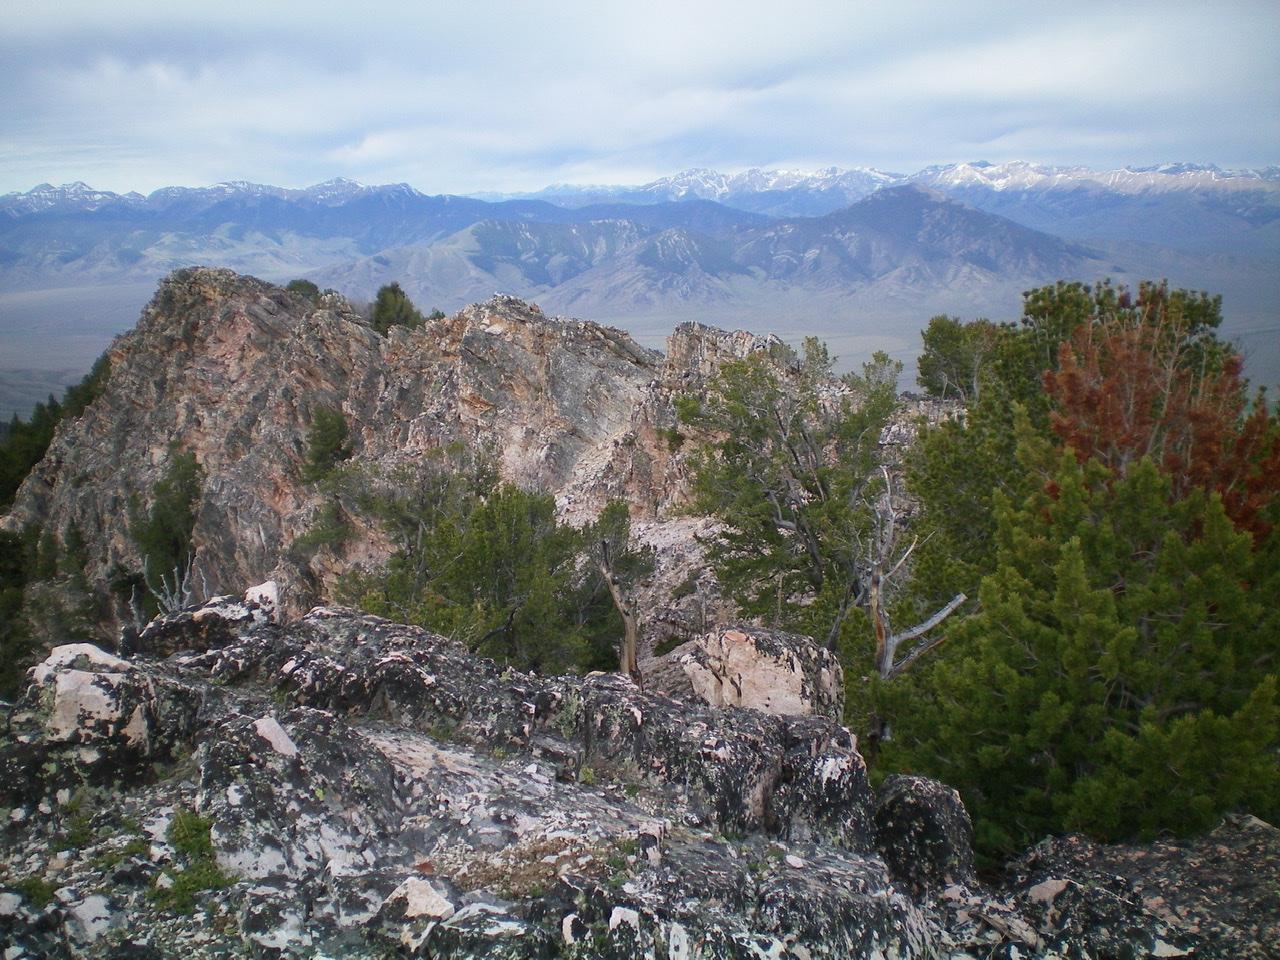 The upper Southwest Ridge of Peak 9634 as viewed from the summit. Livingston Douglas Photo